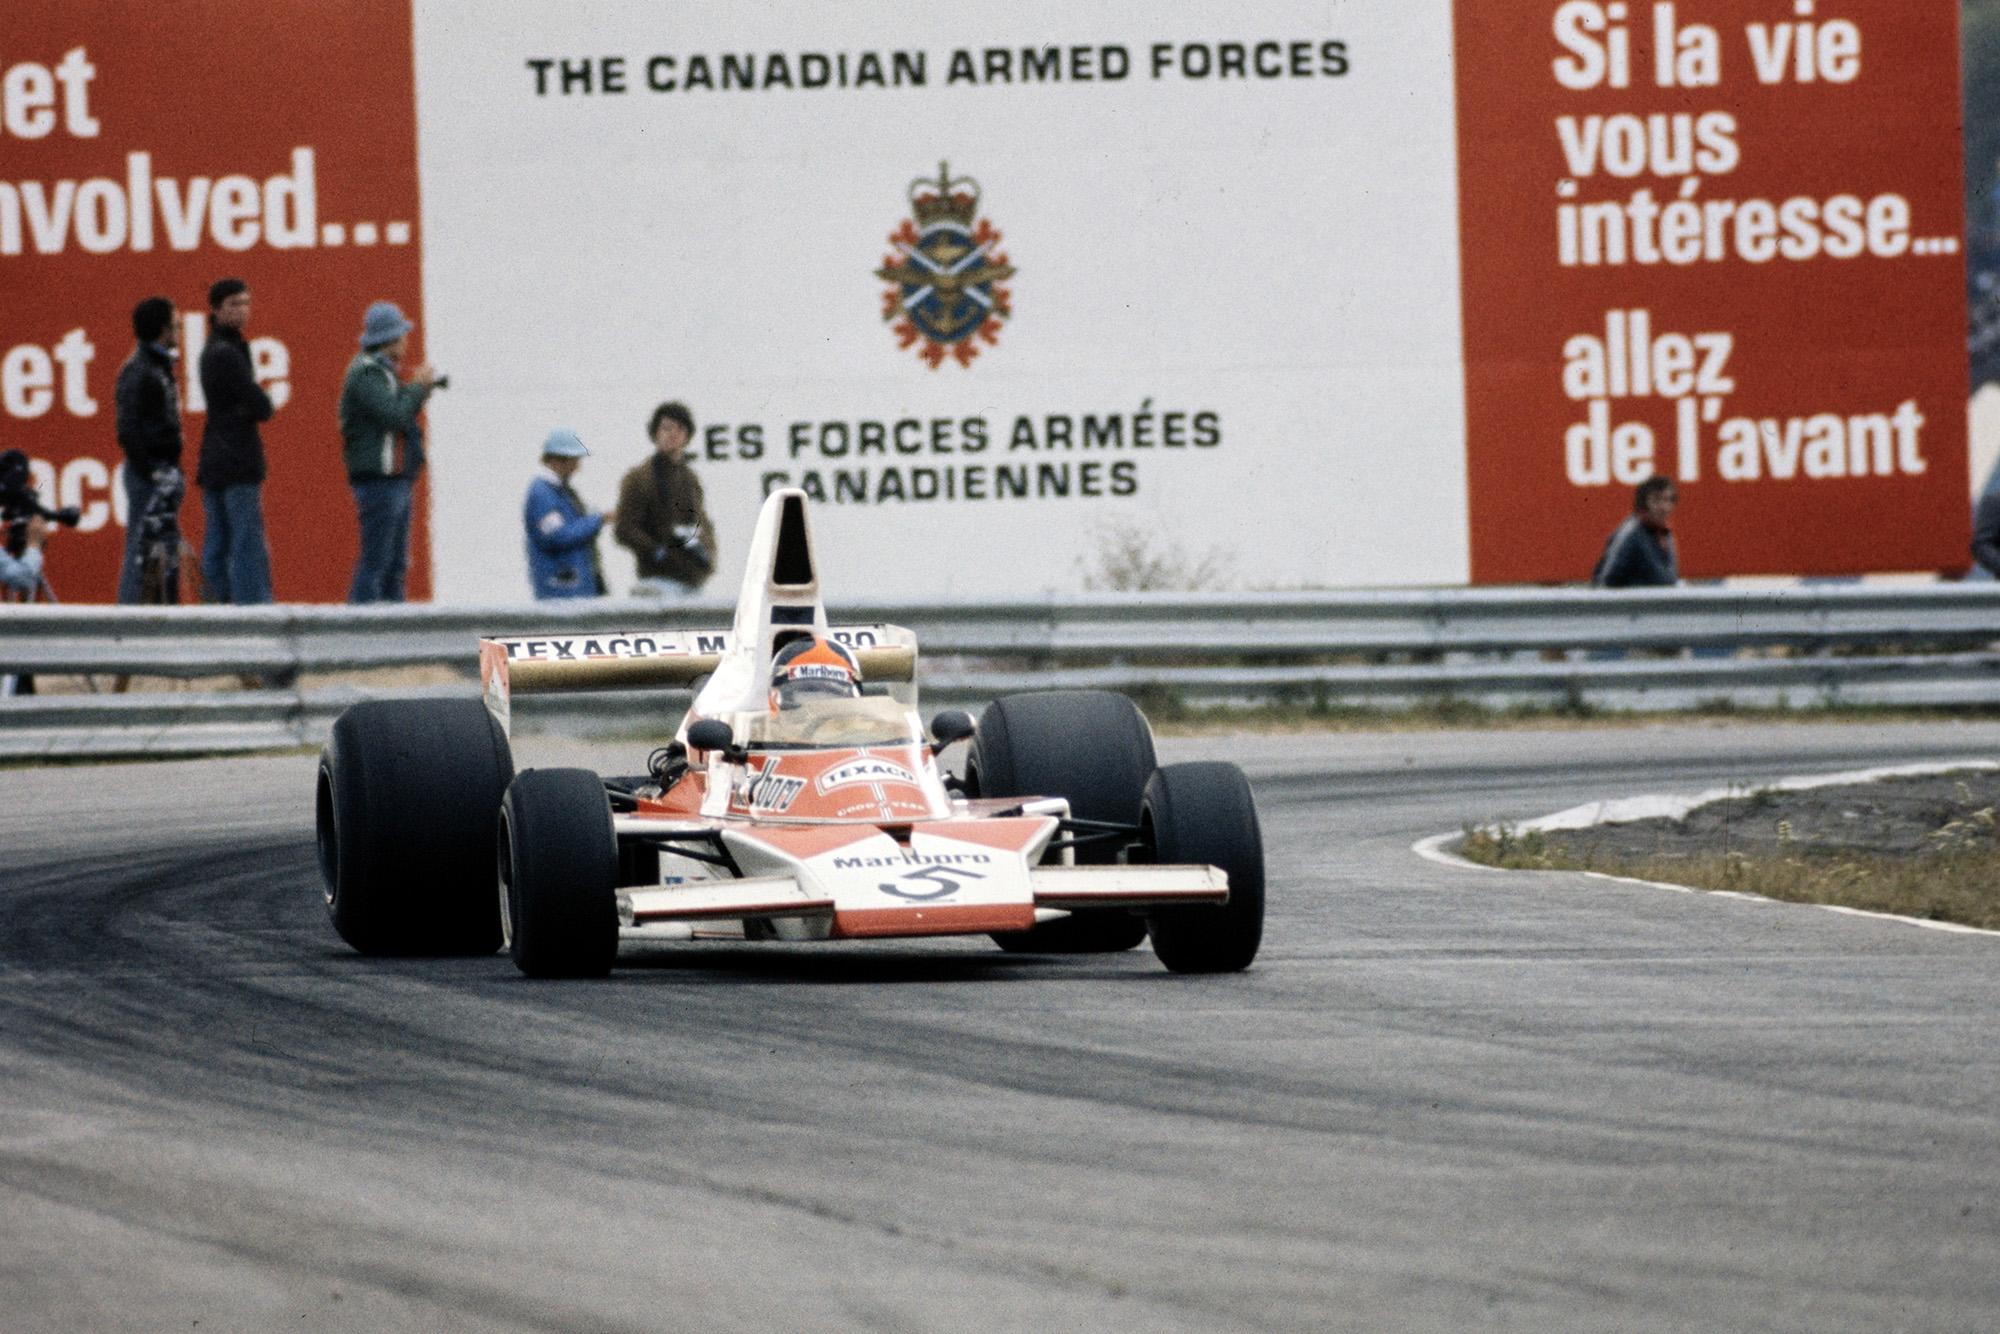 Emerson Fittipaldi (McLaren) racing at the 1974 Canadian grand Prix, Mosport.